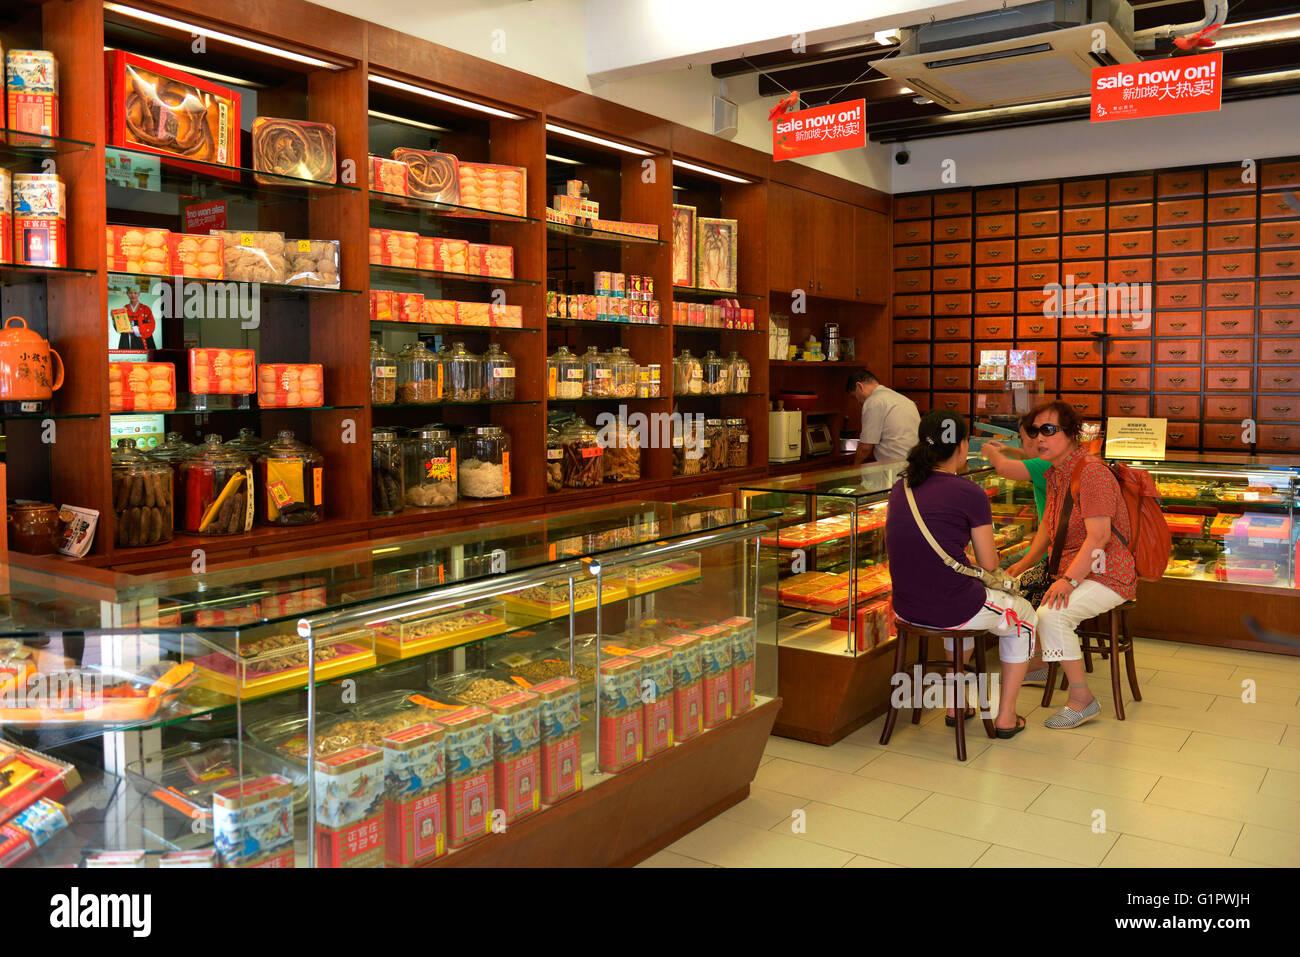 Apotheke, Chinatown, Singapur - Stock Image